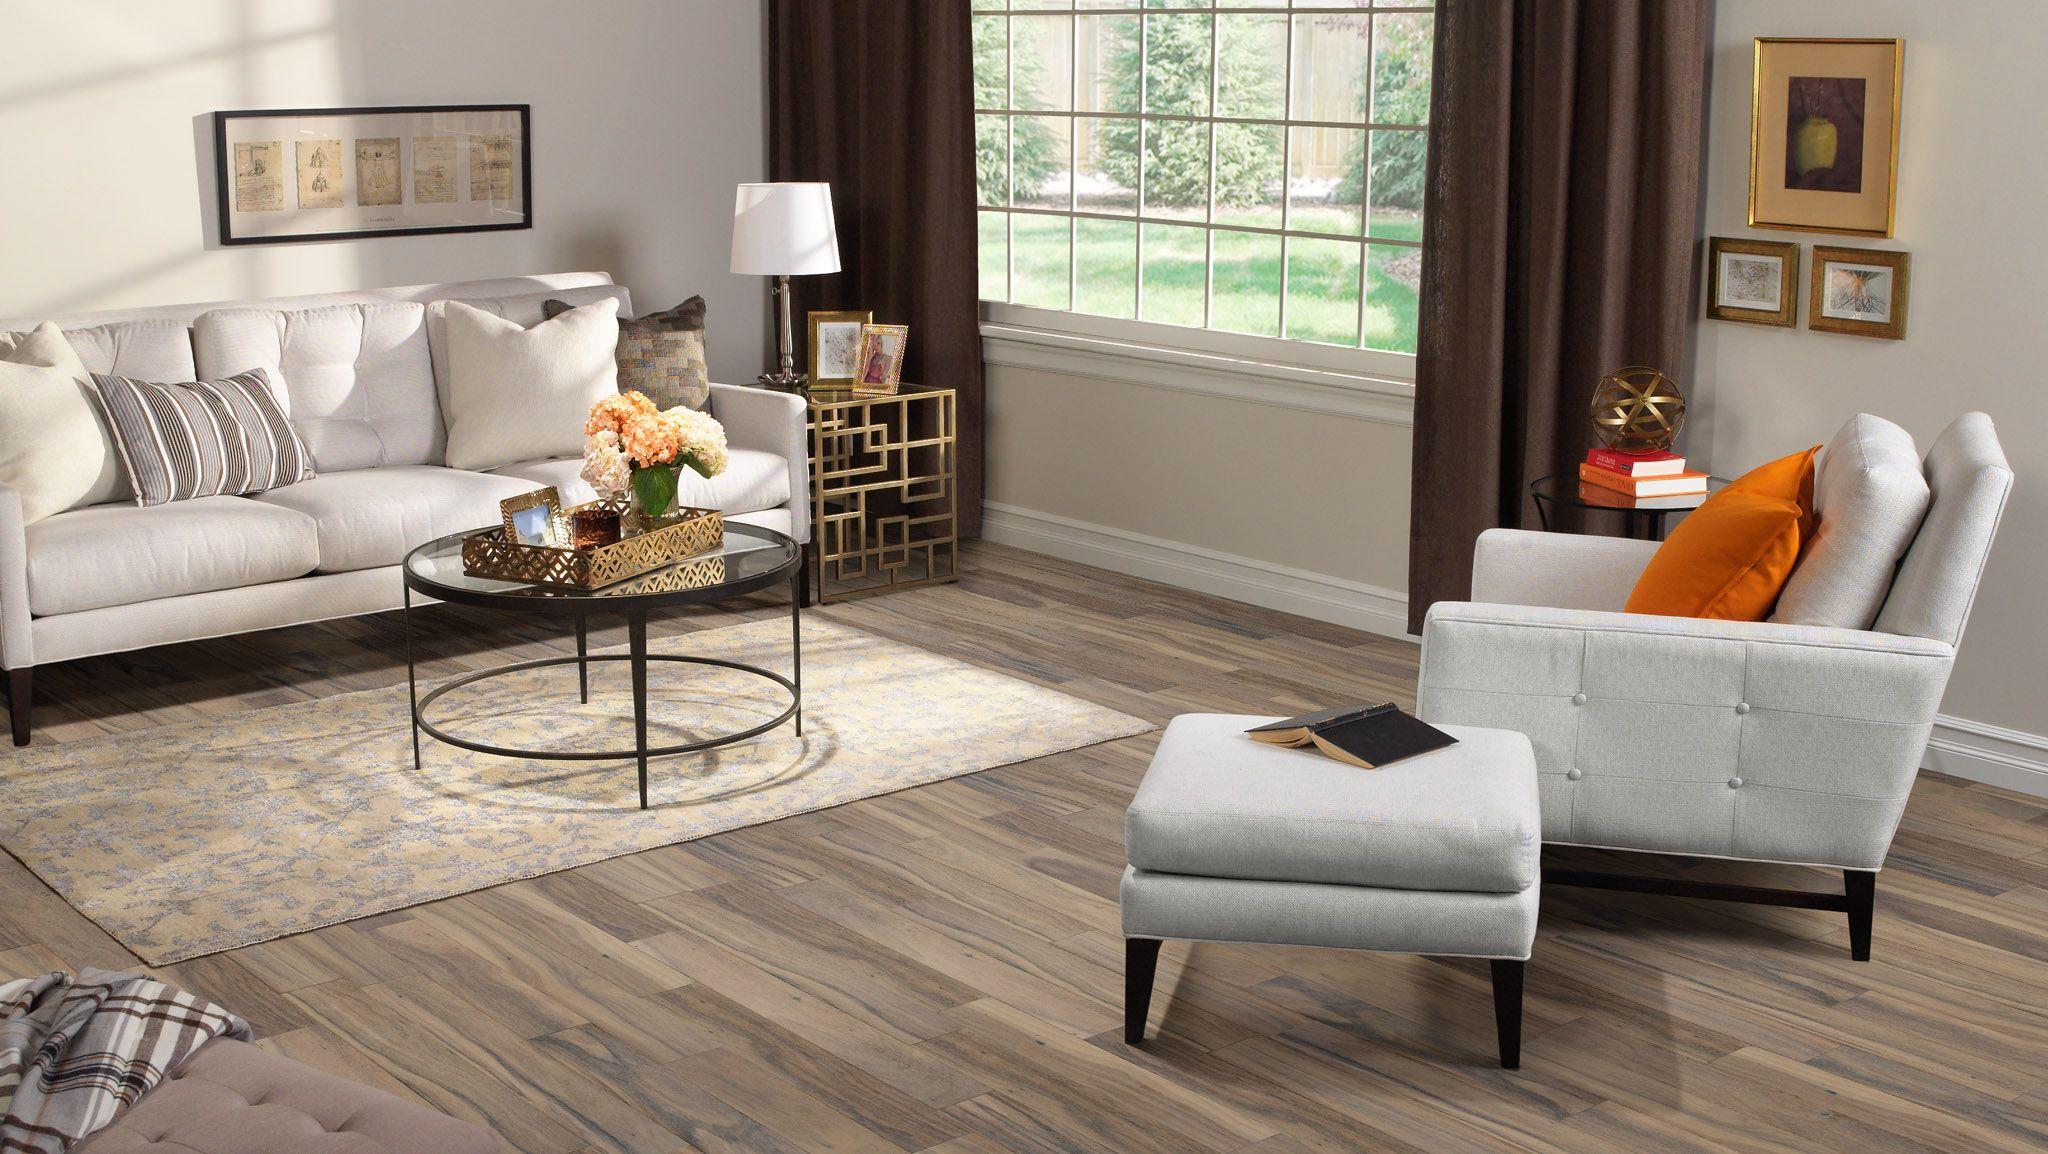 Kentwood Brushed Acacia Grayfield Engineered Wood Floors